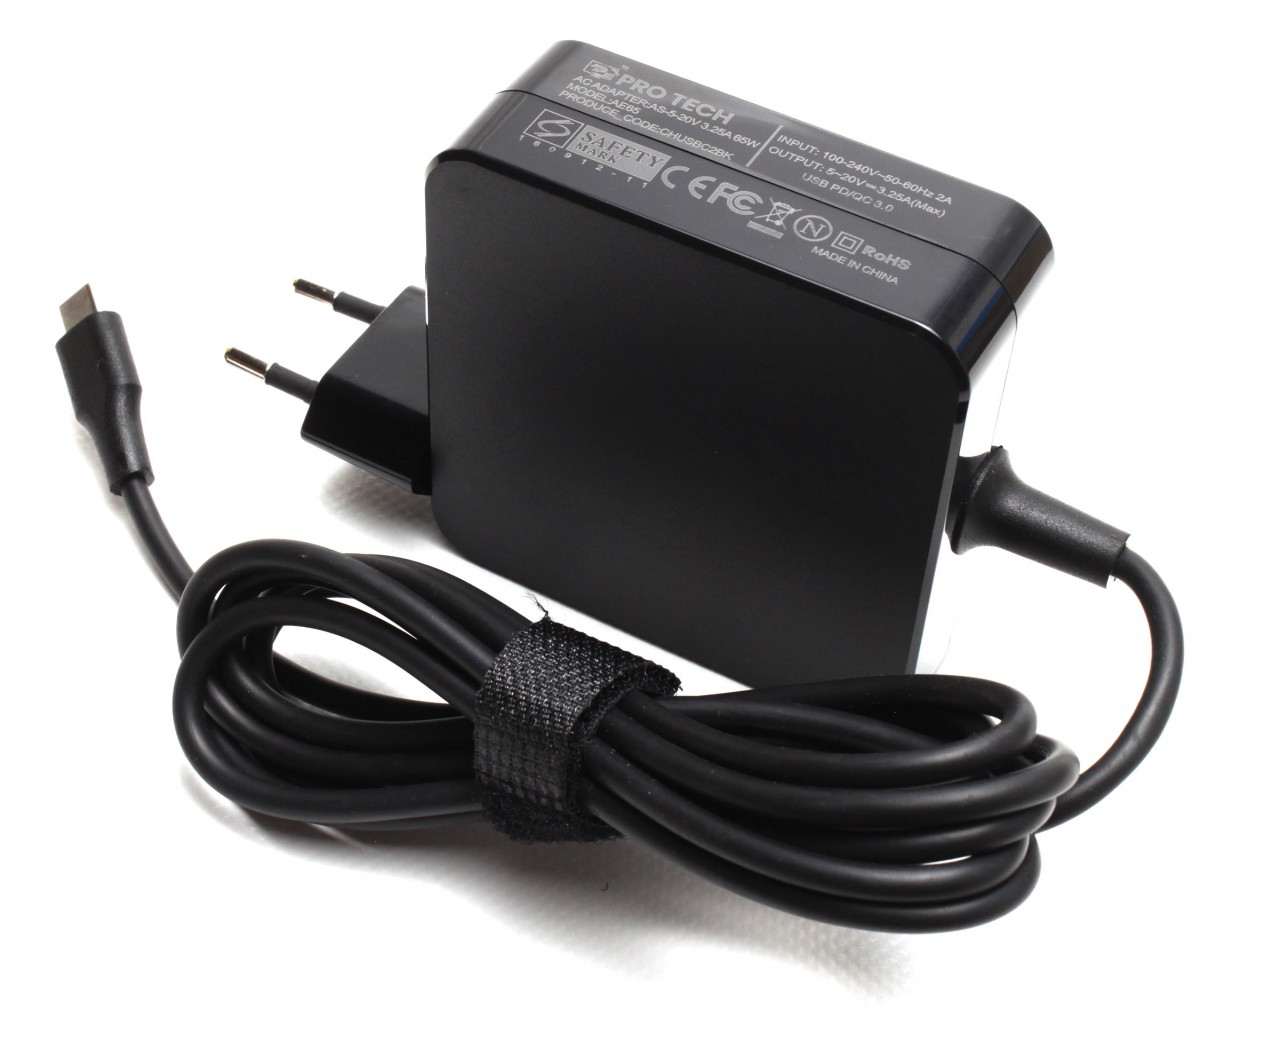 Incarcator Apple 661 02315 65W Replacement imagine powerlaptop.ro 2021